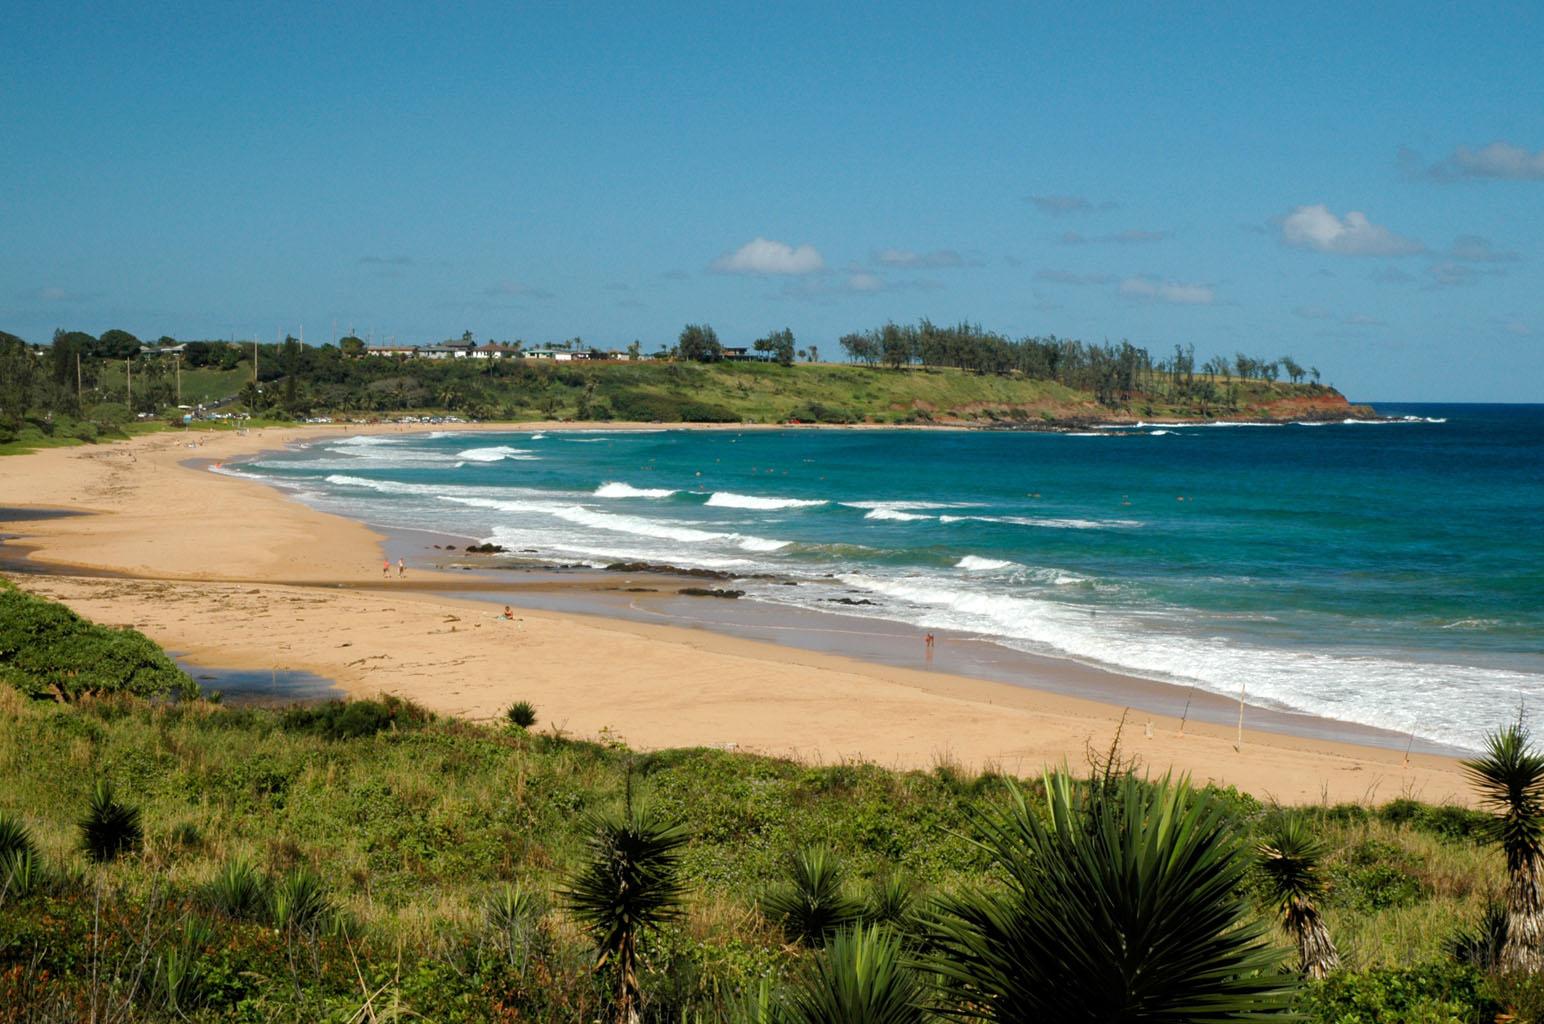 File Kealia Beach Located Along The Royal Coconut Coast Of Kauai Hawaii Jpeg Wikimedia Commons